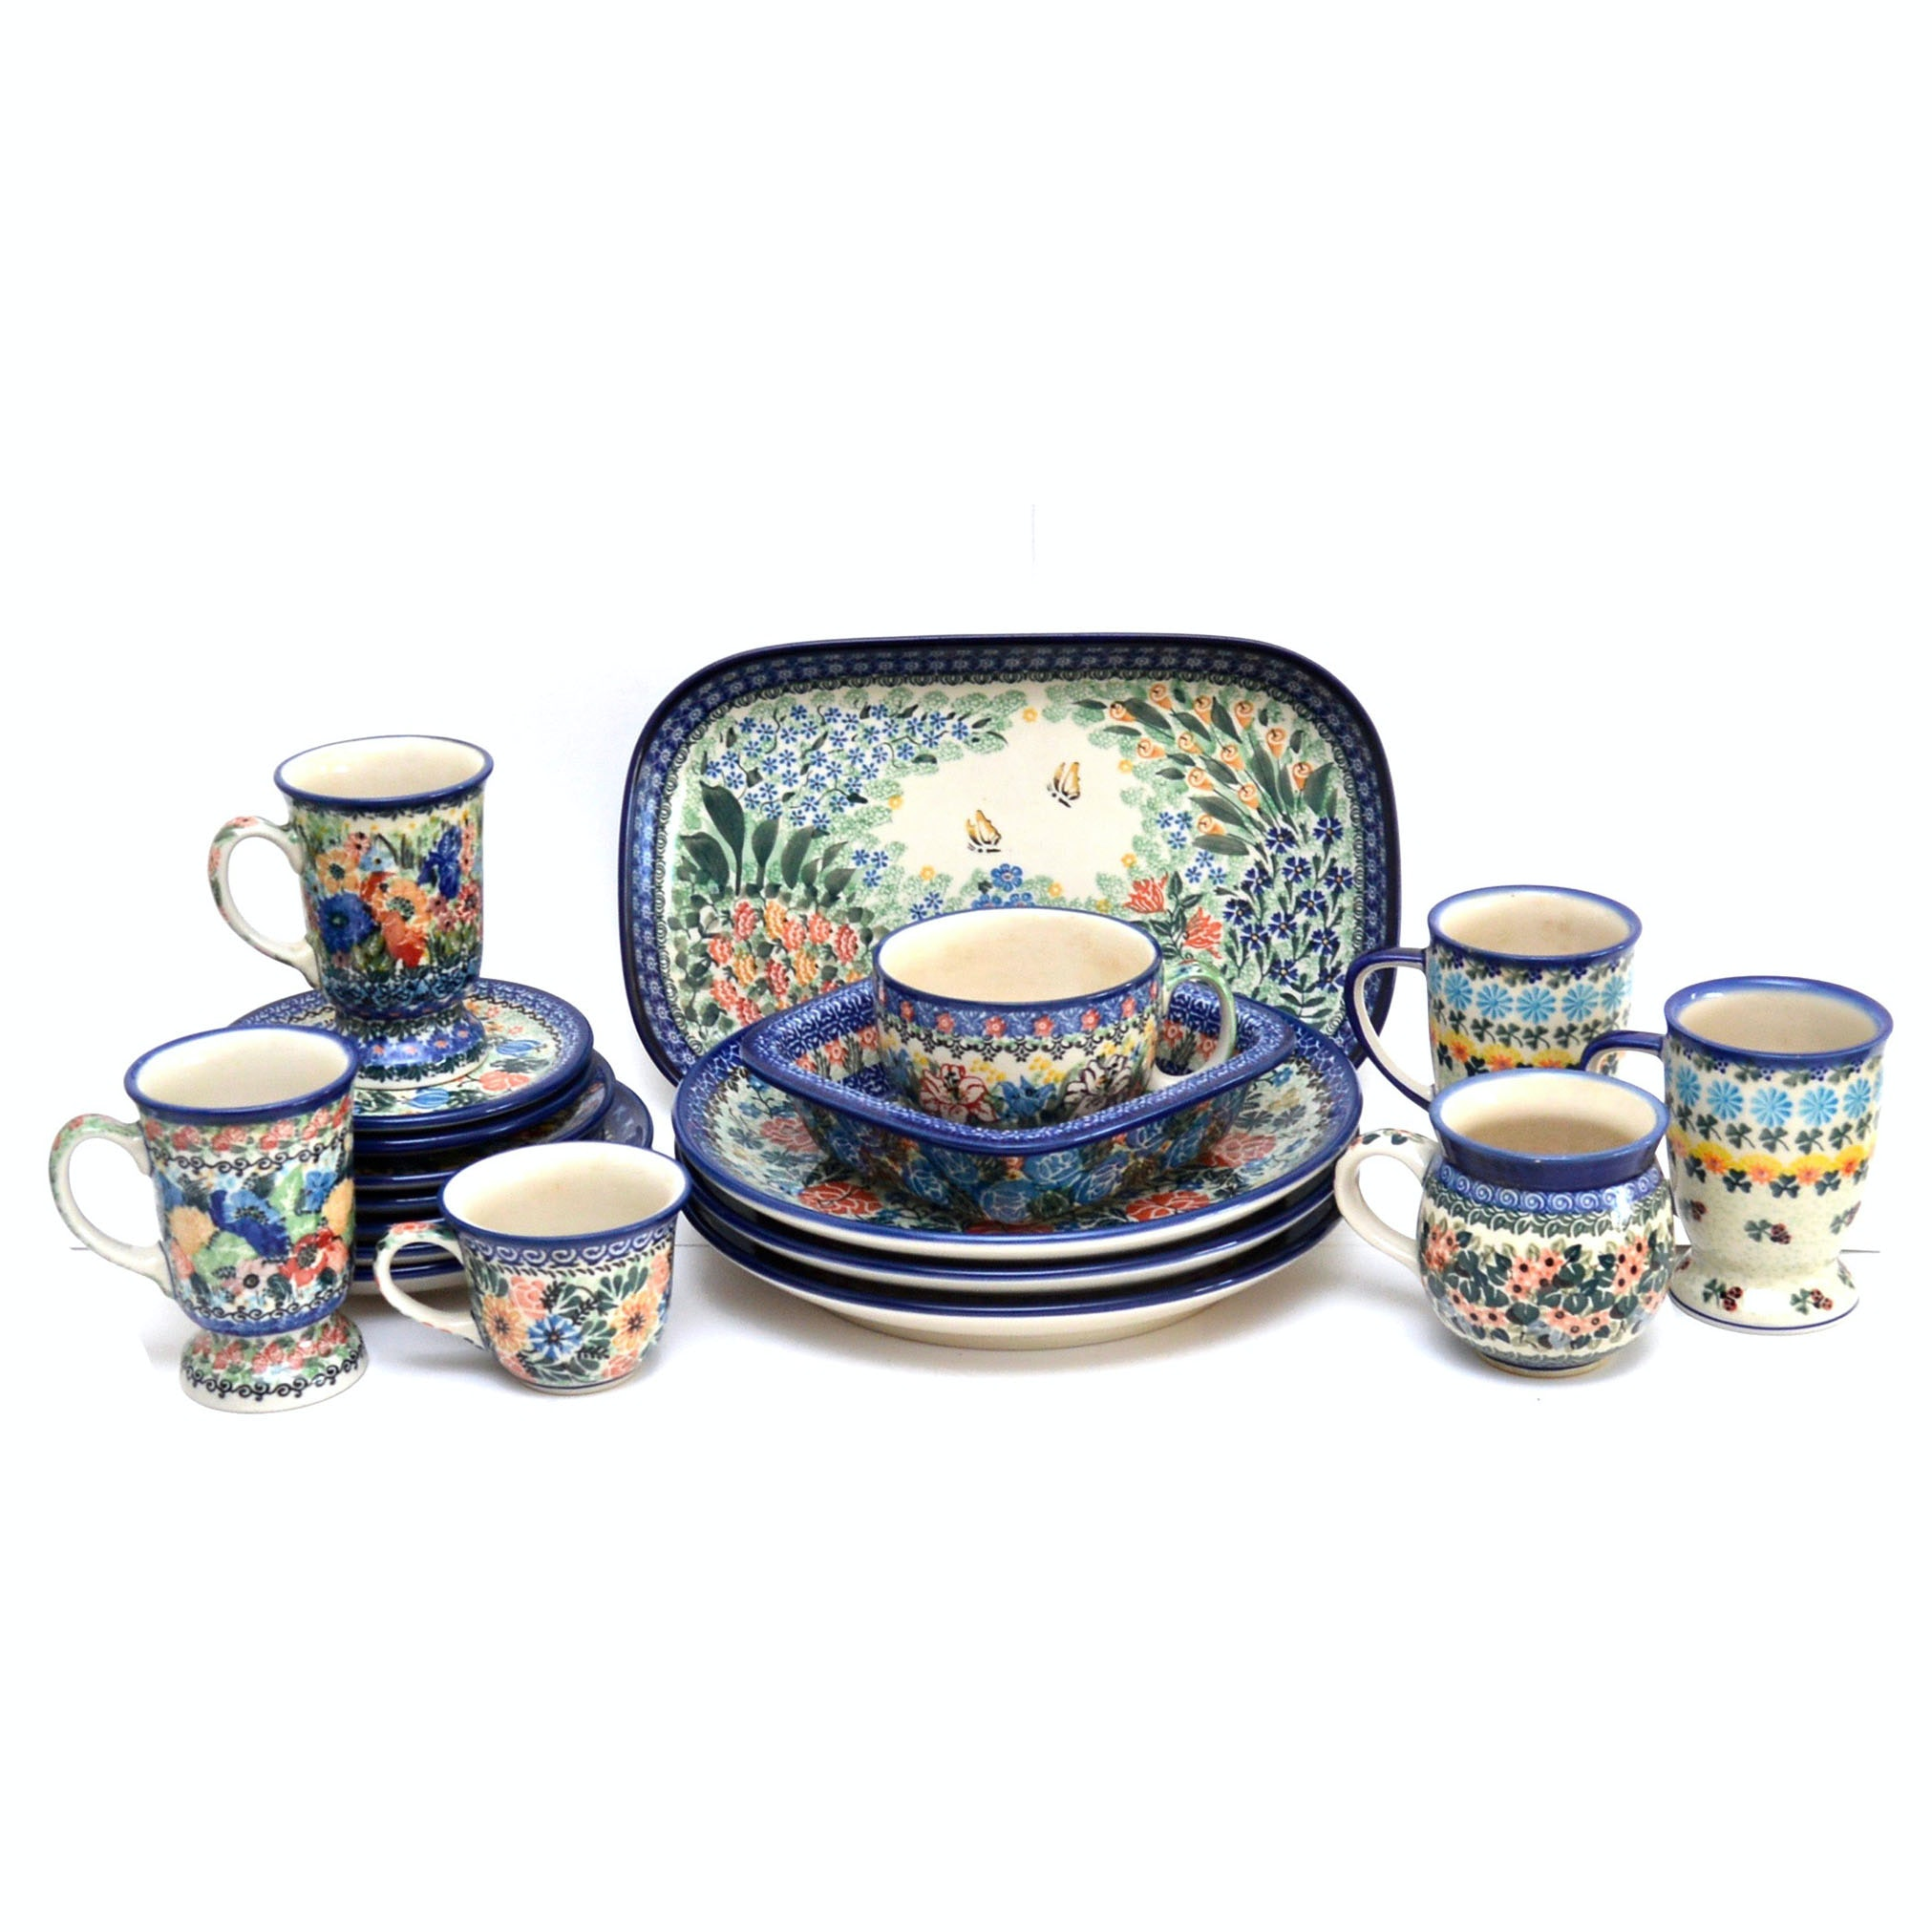 Collection of Unikat Polish Pottery